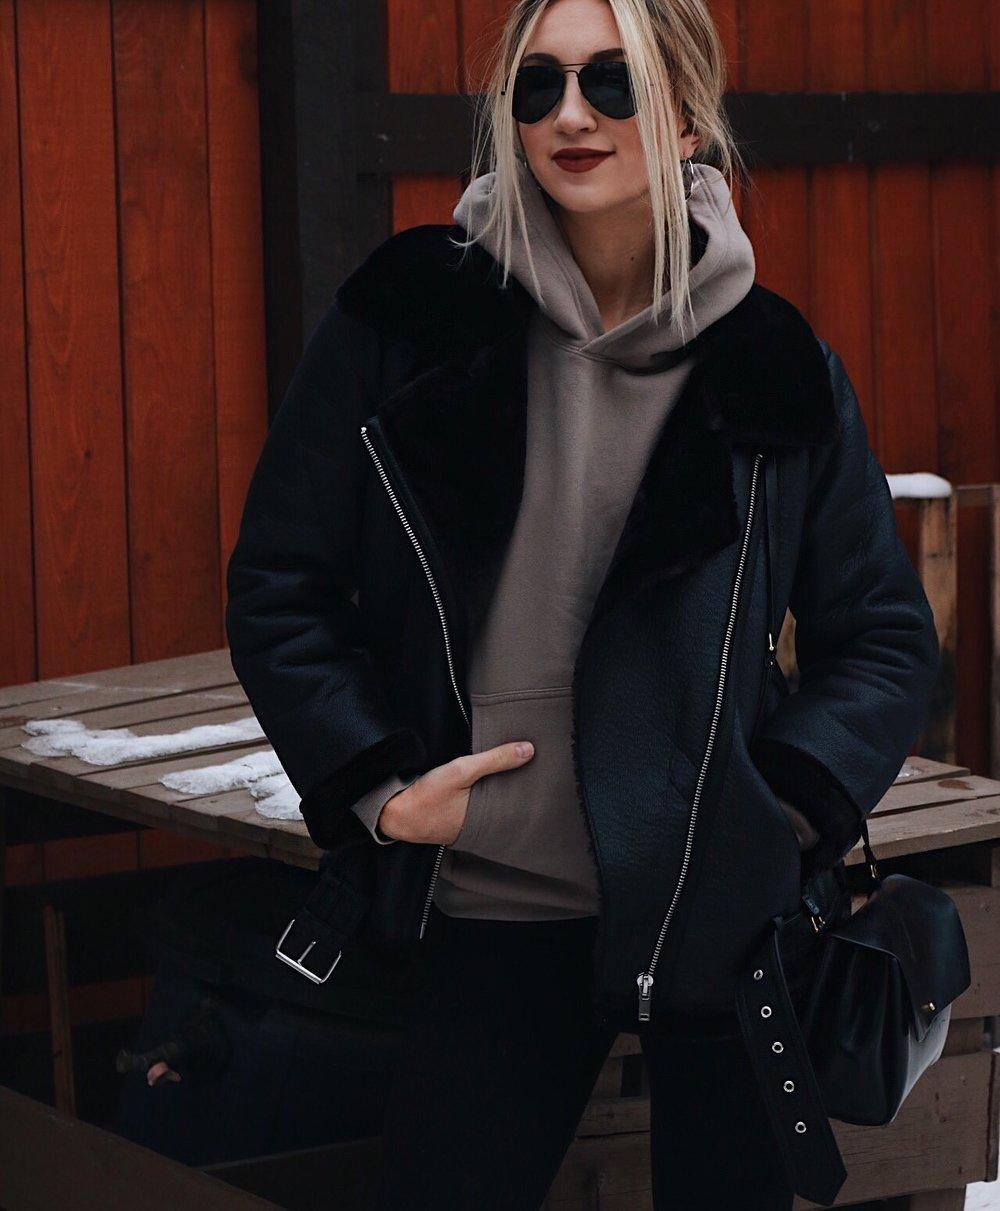 ootd aritzia zara lined jacket leather sock boots brittanylaurens brittany lauren saskatoon saskatchewan canadian blogger youtuber